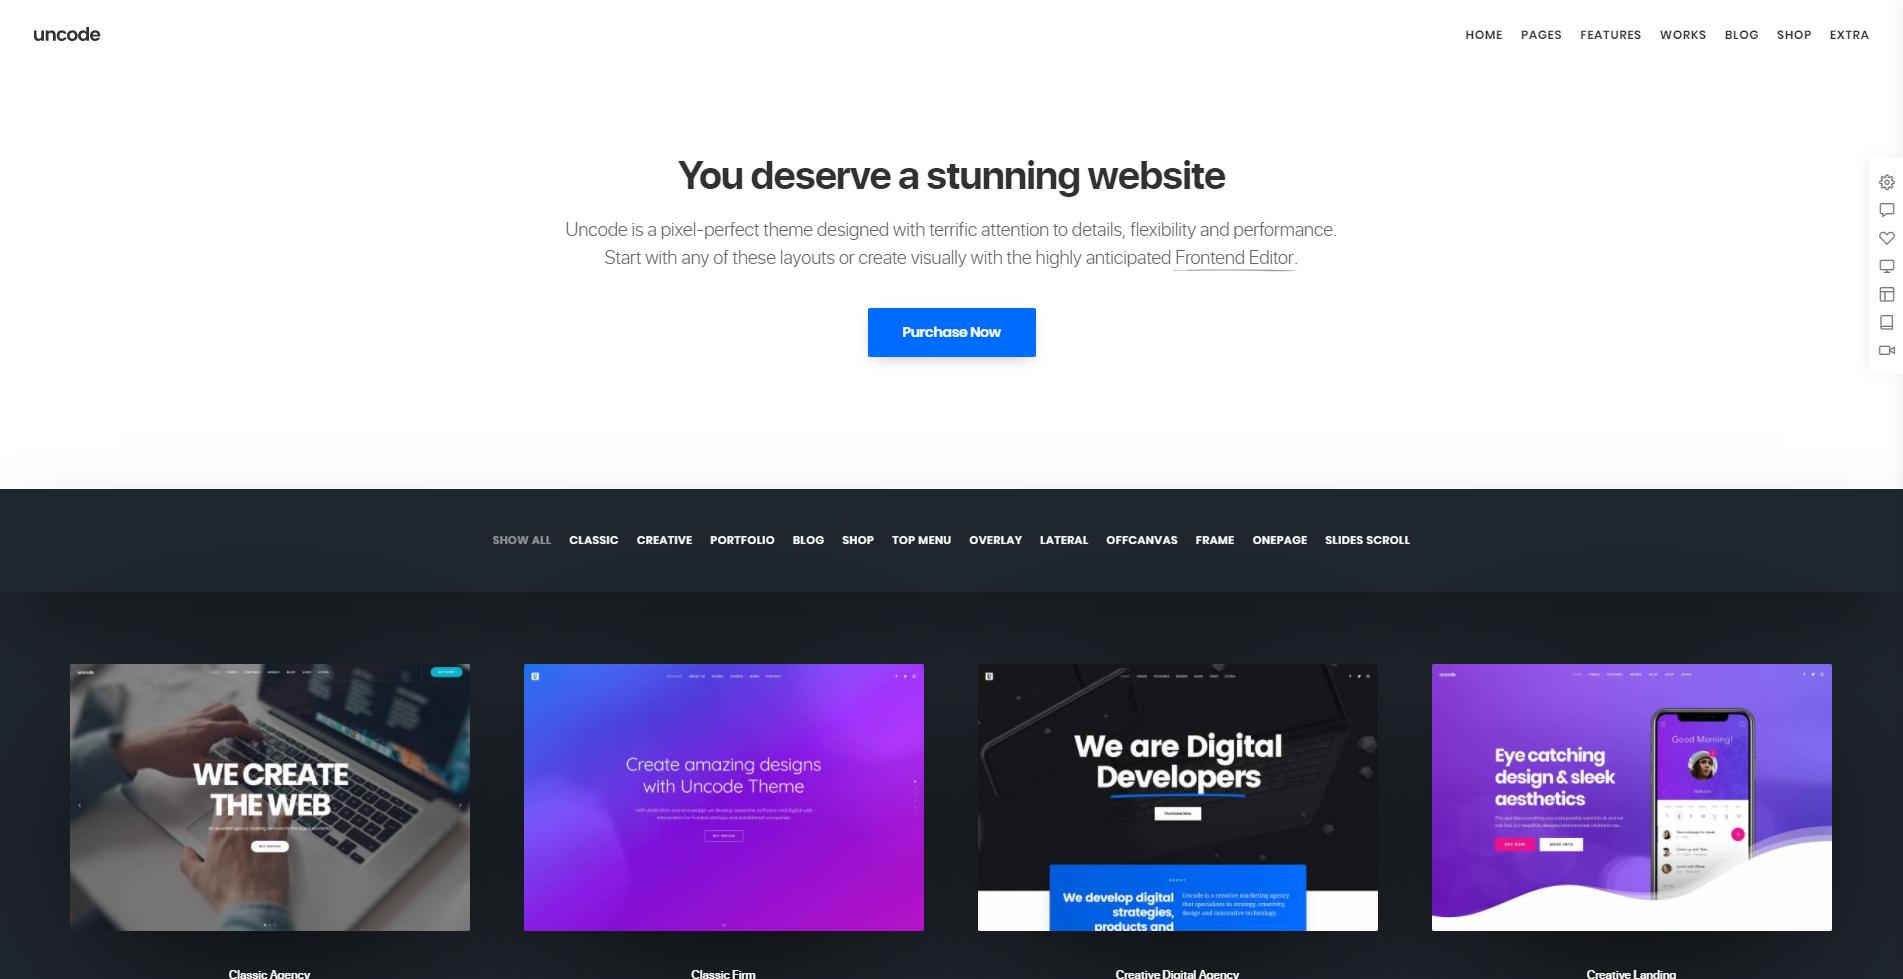 Uncode homepage